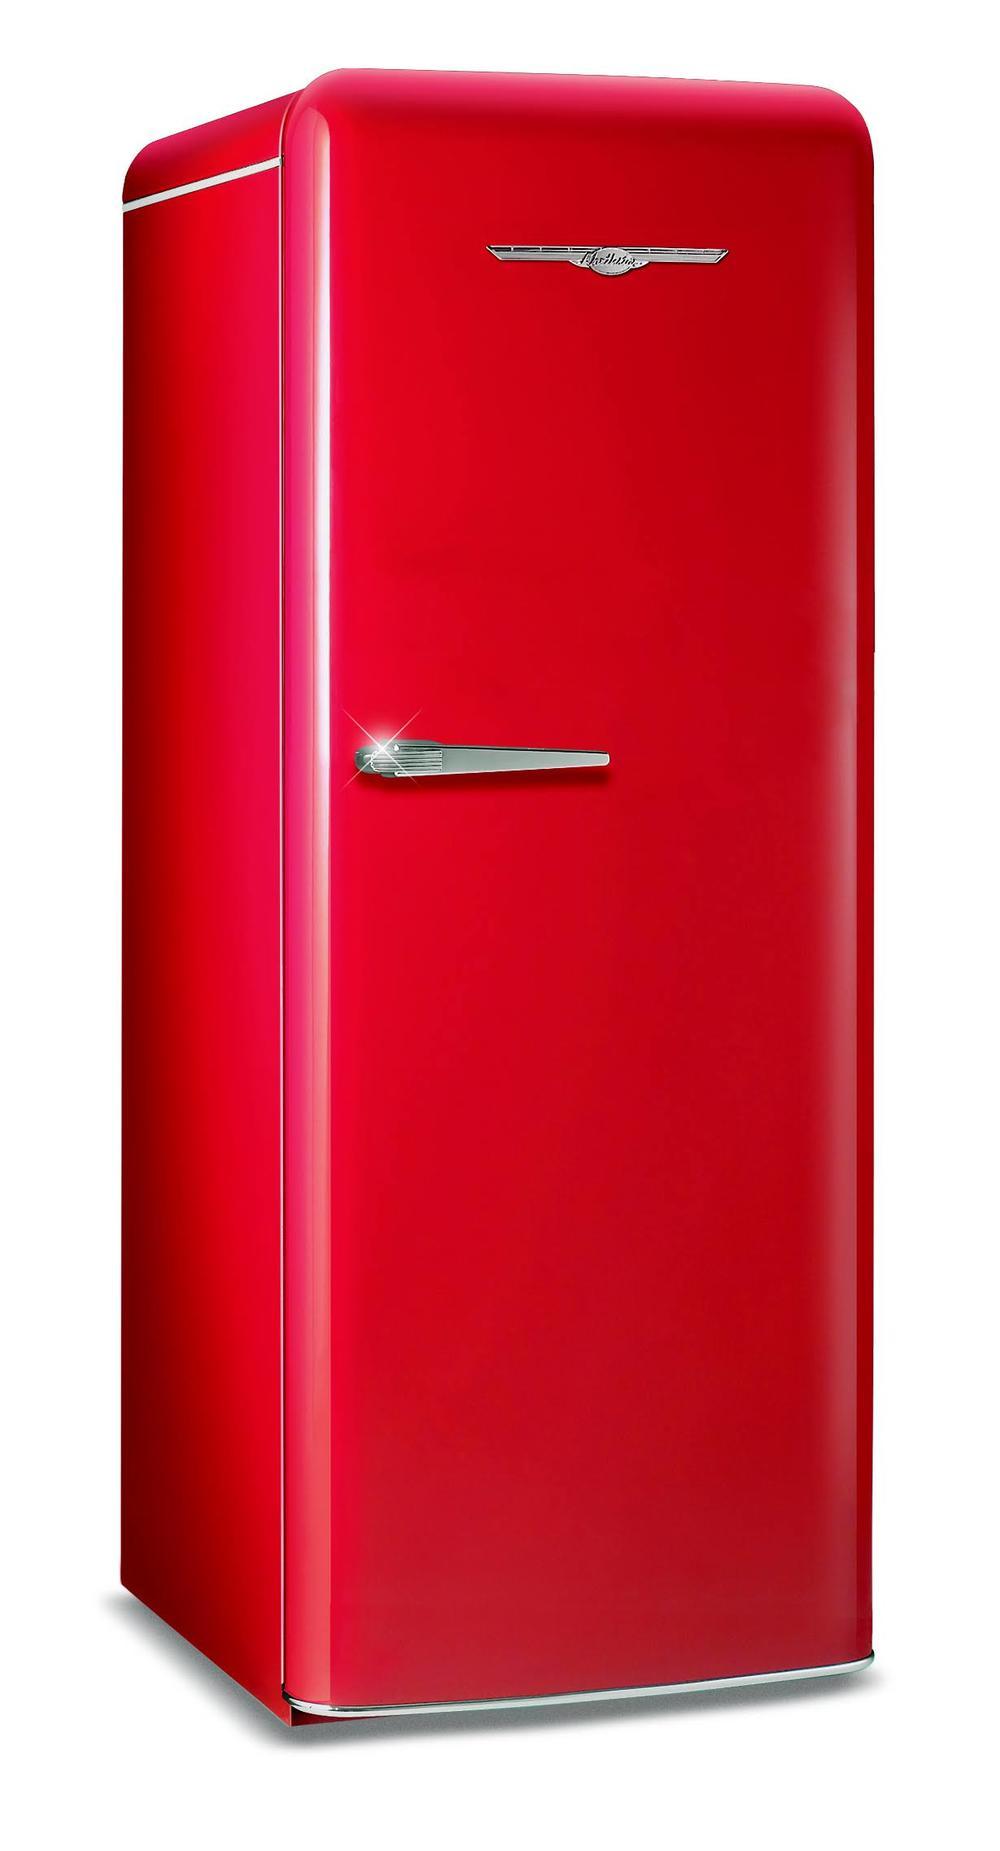 Elmira Refrigerator1949